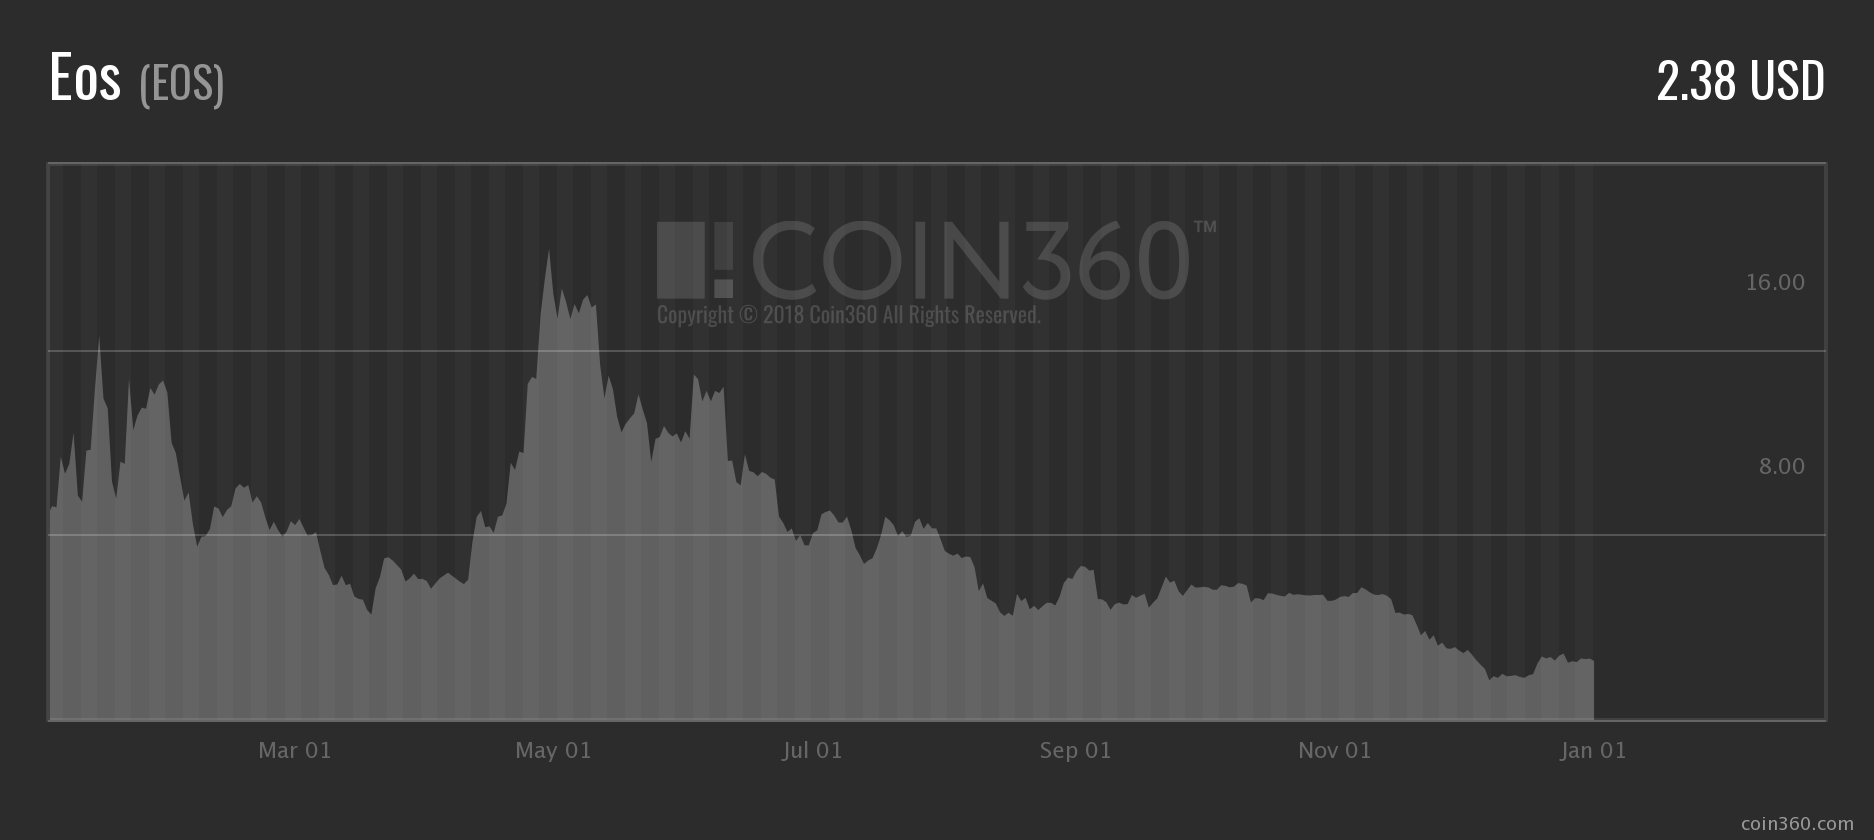 EOS Price Graph Analysis